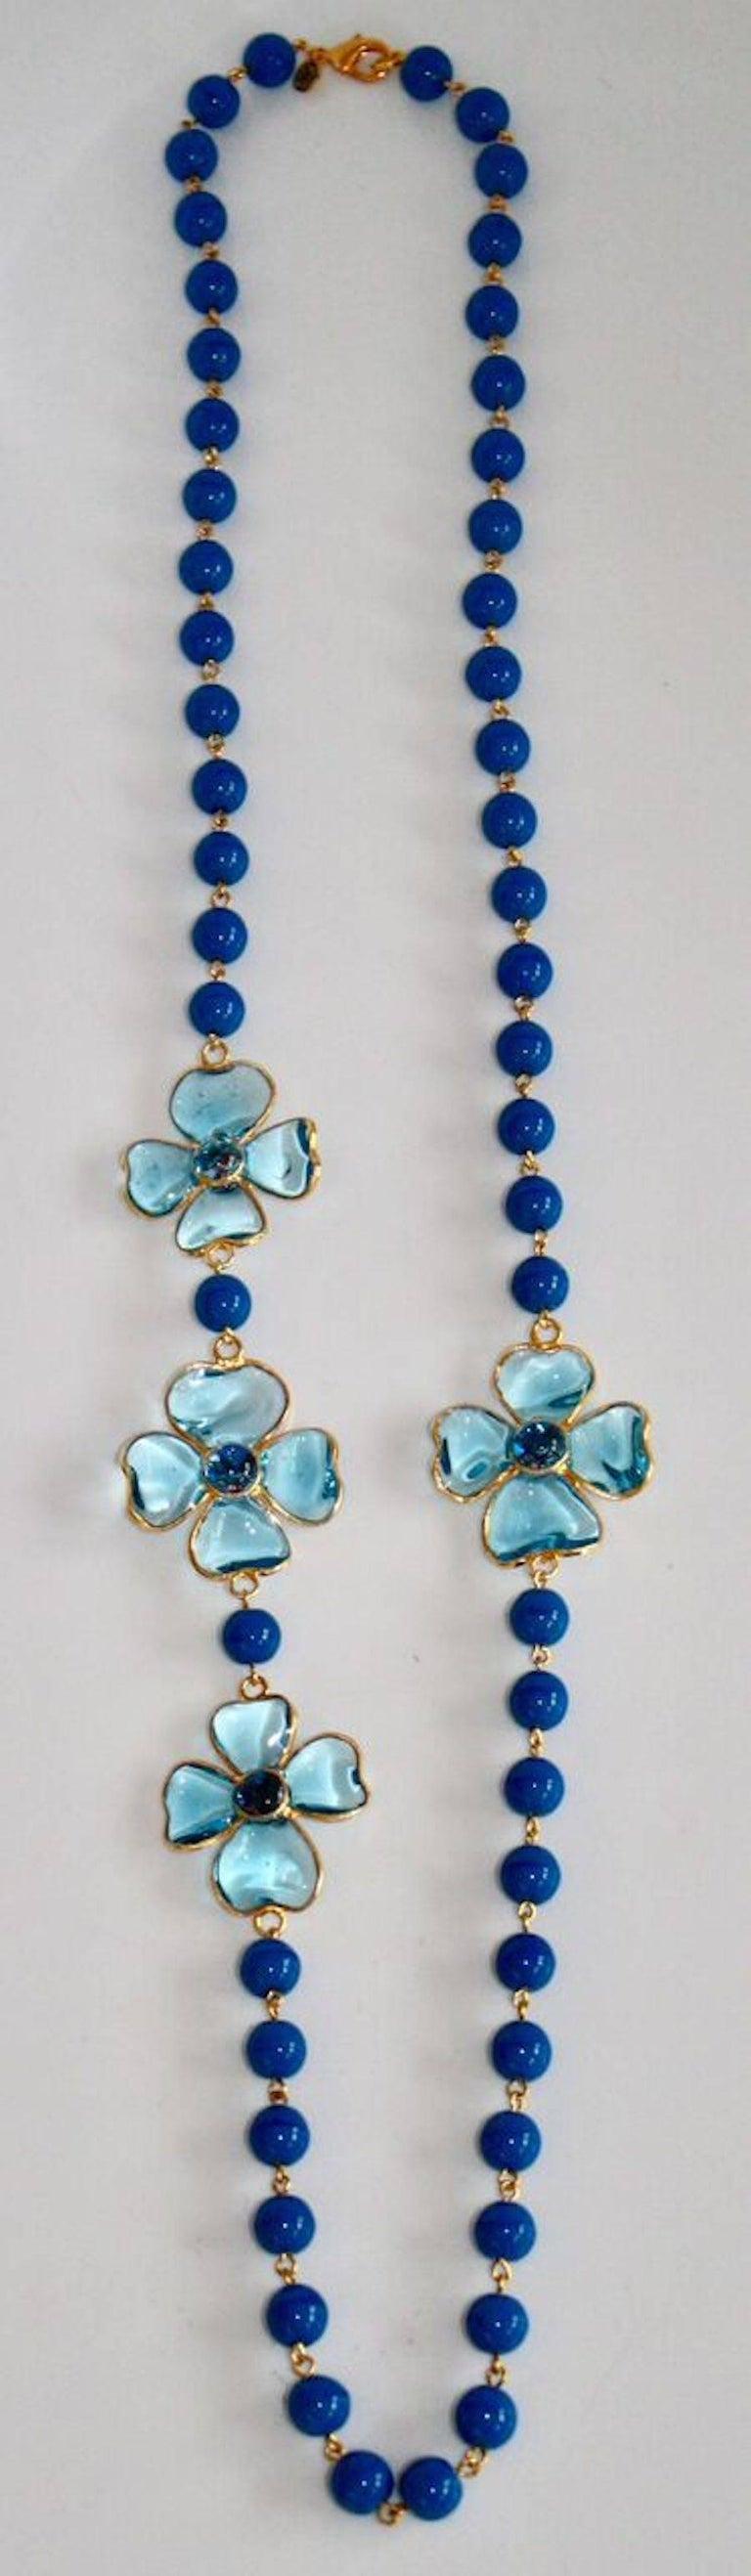 Francoise Montague Blue Pate de Verre Glass Amalfi Necklace In New Condition For Sale In Virginia Beach, VA